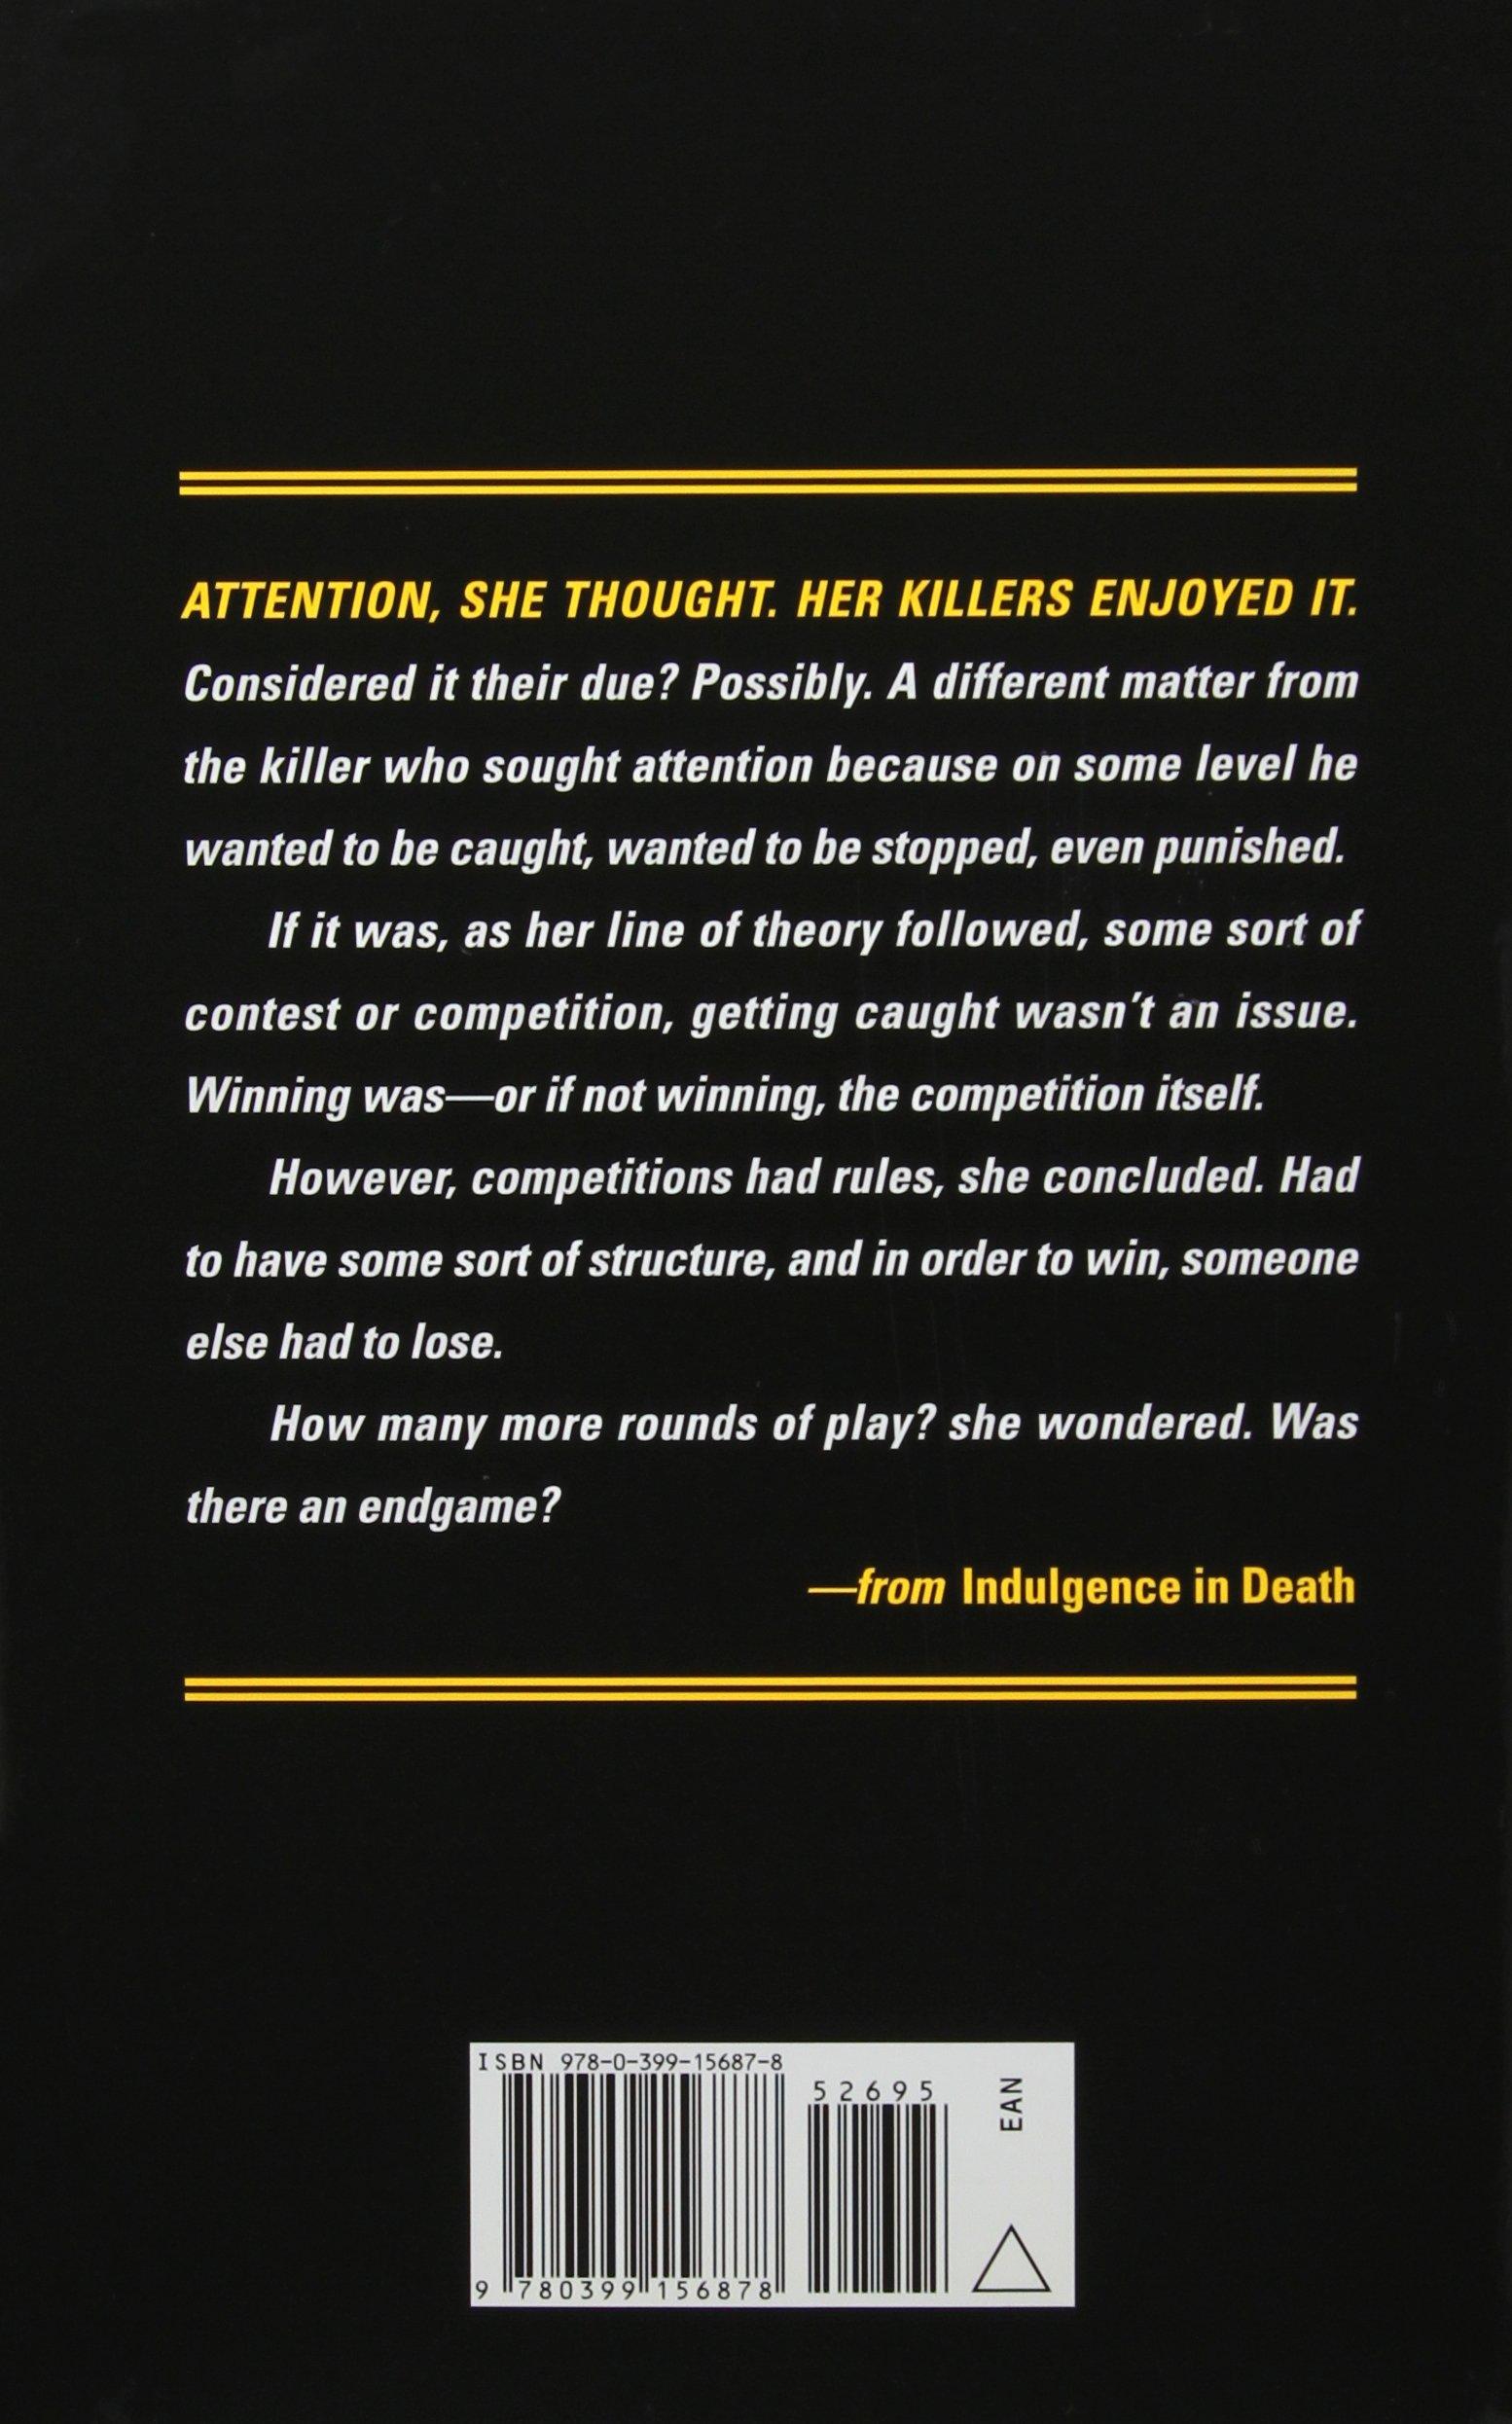 Indulgence in Death